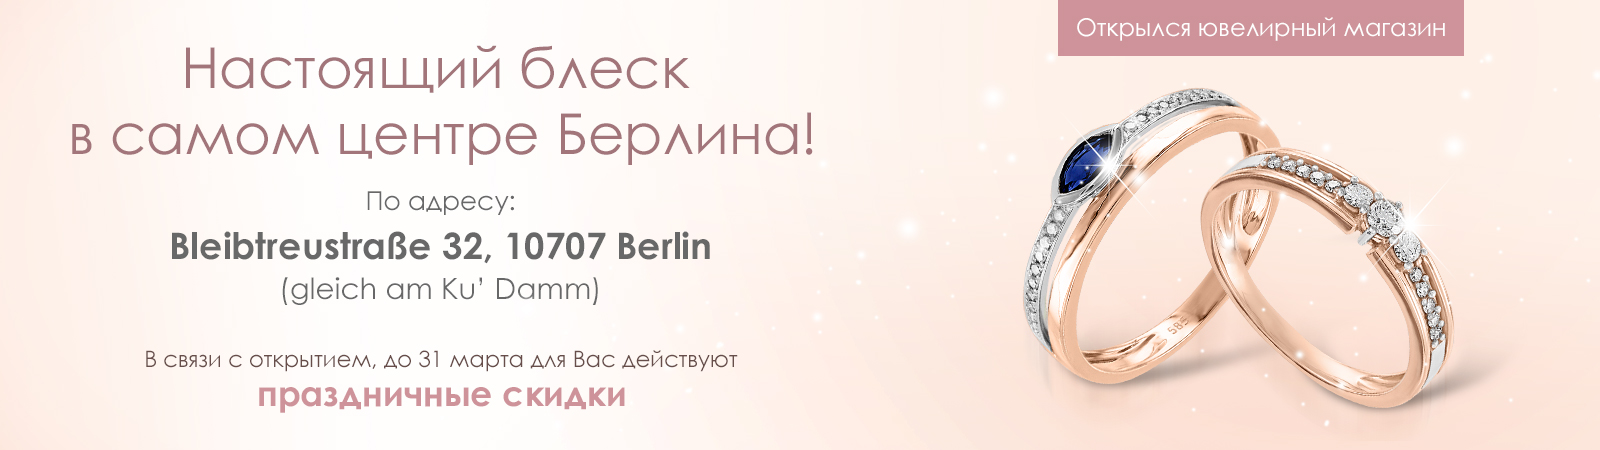 Berlin neueöffnung